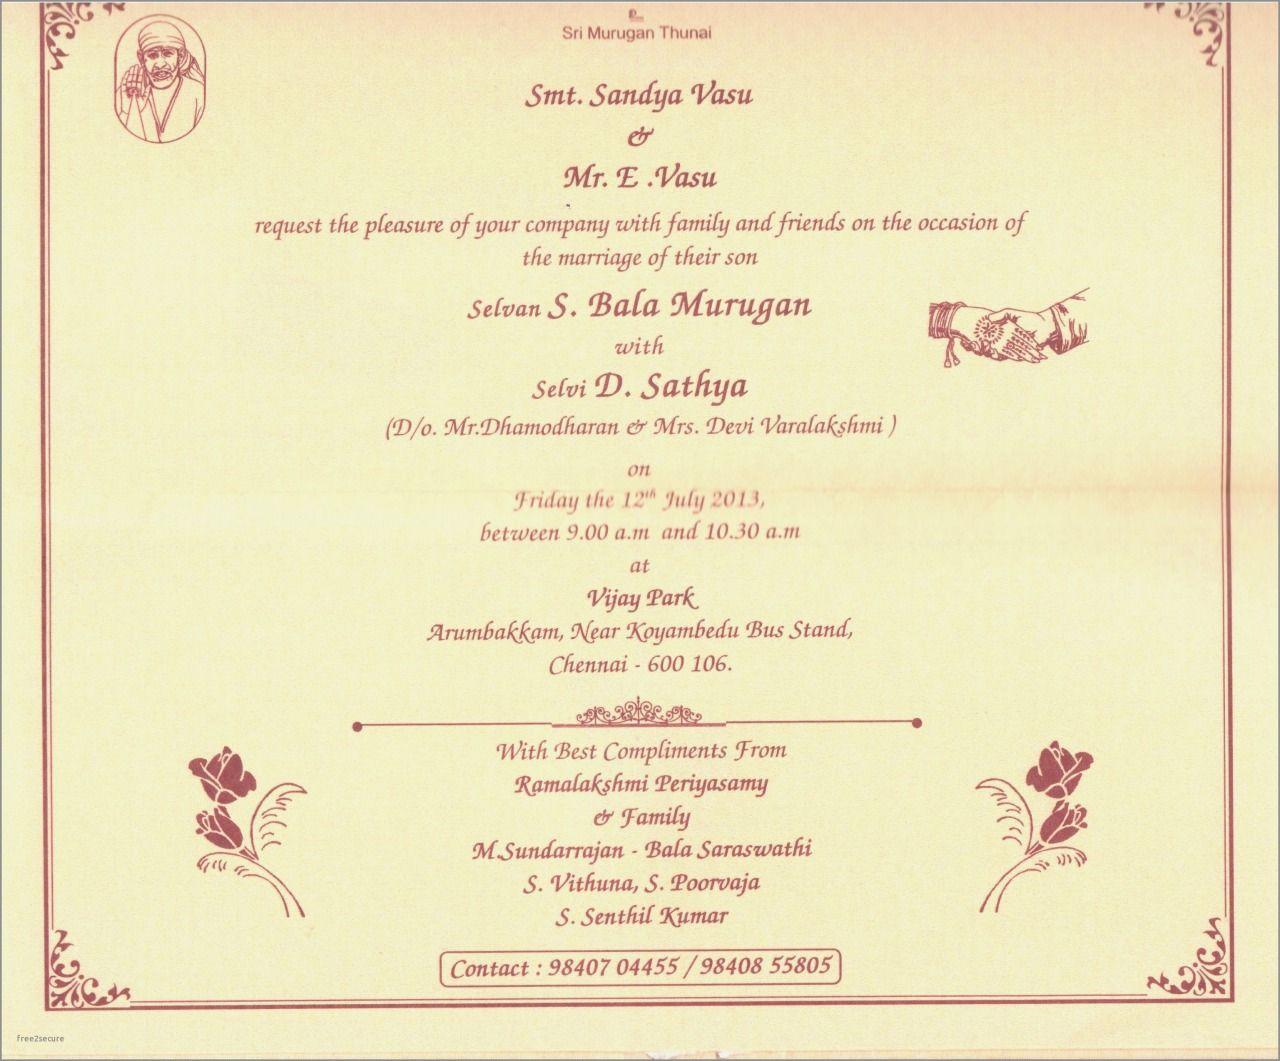 4 Fresh Wedding Invitations In Chennai 4 Check more at https